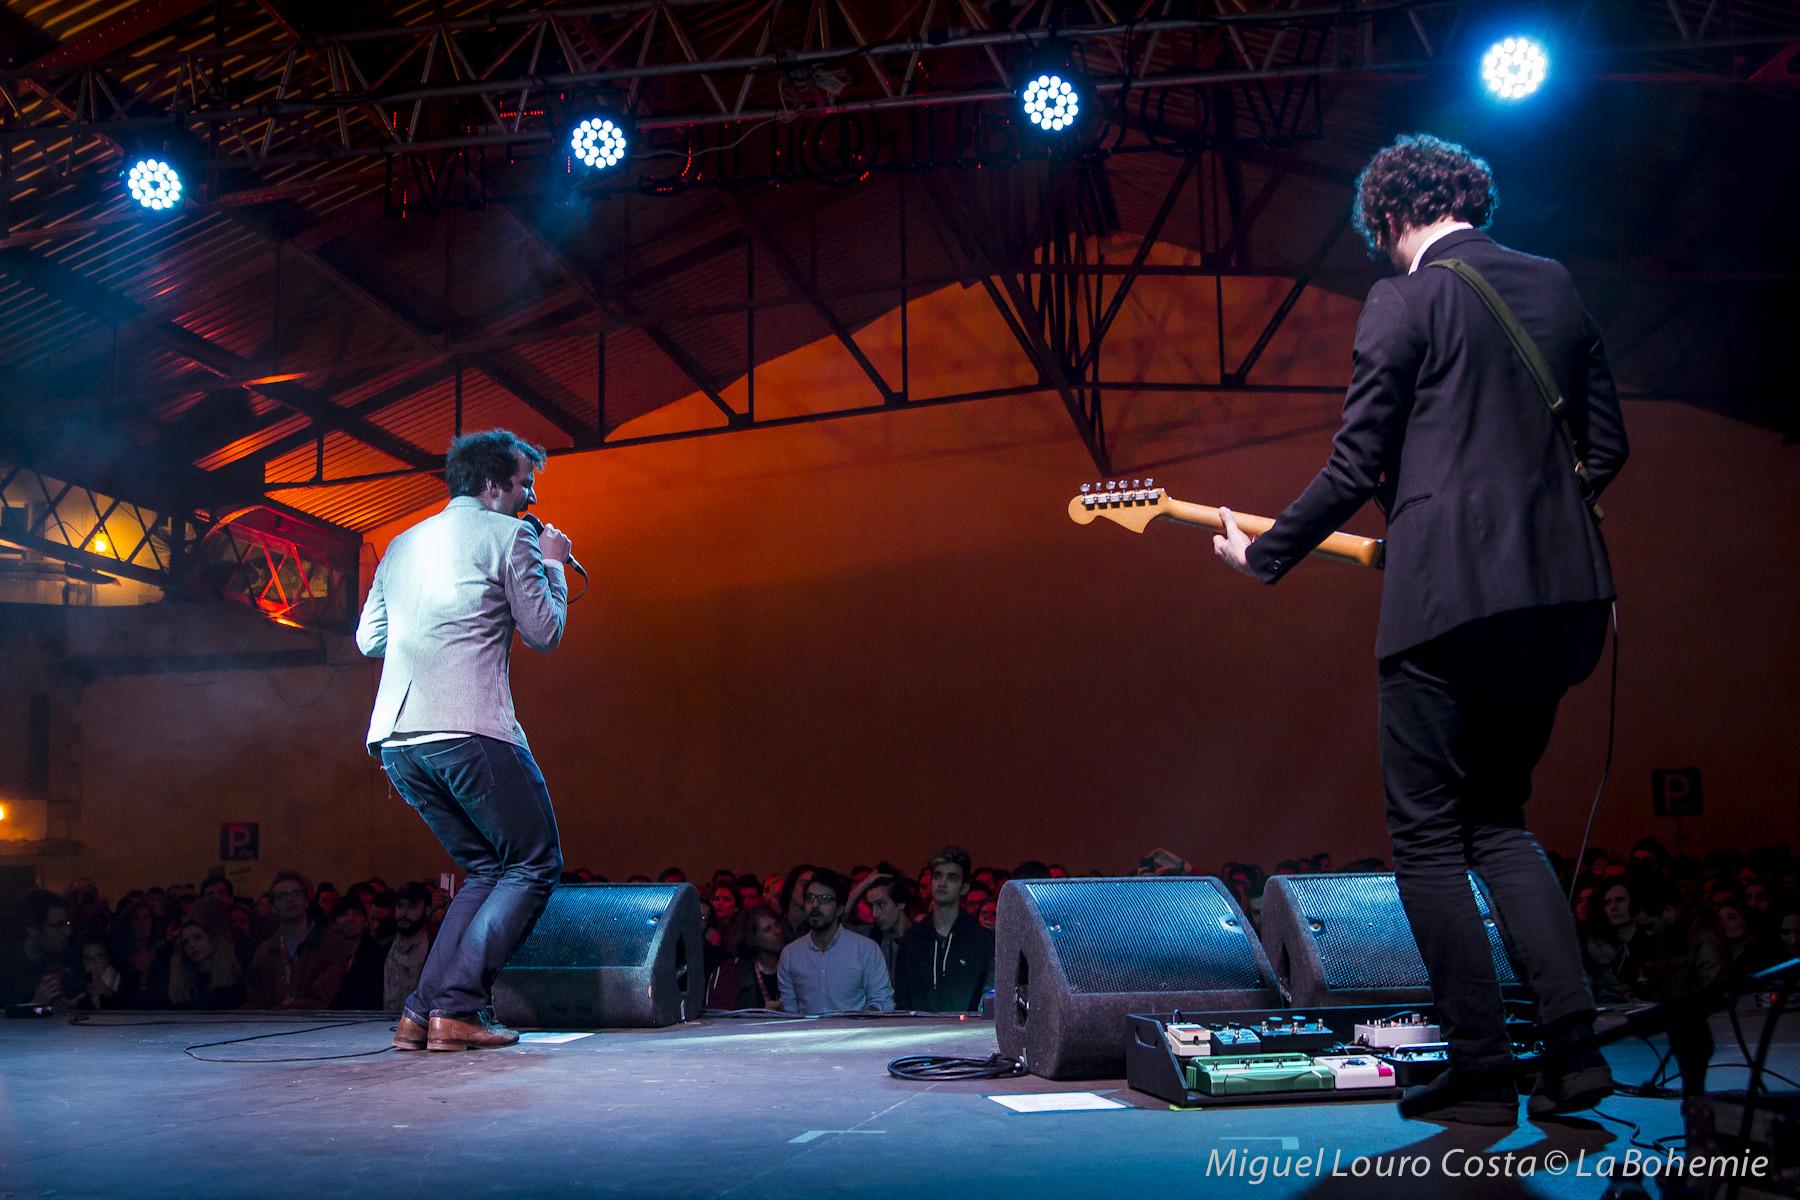 Foto: Miguel Louro Costa